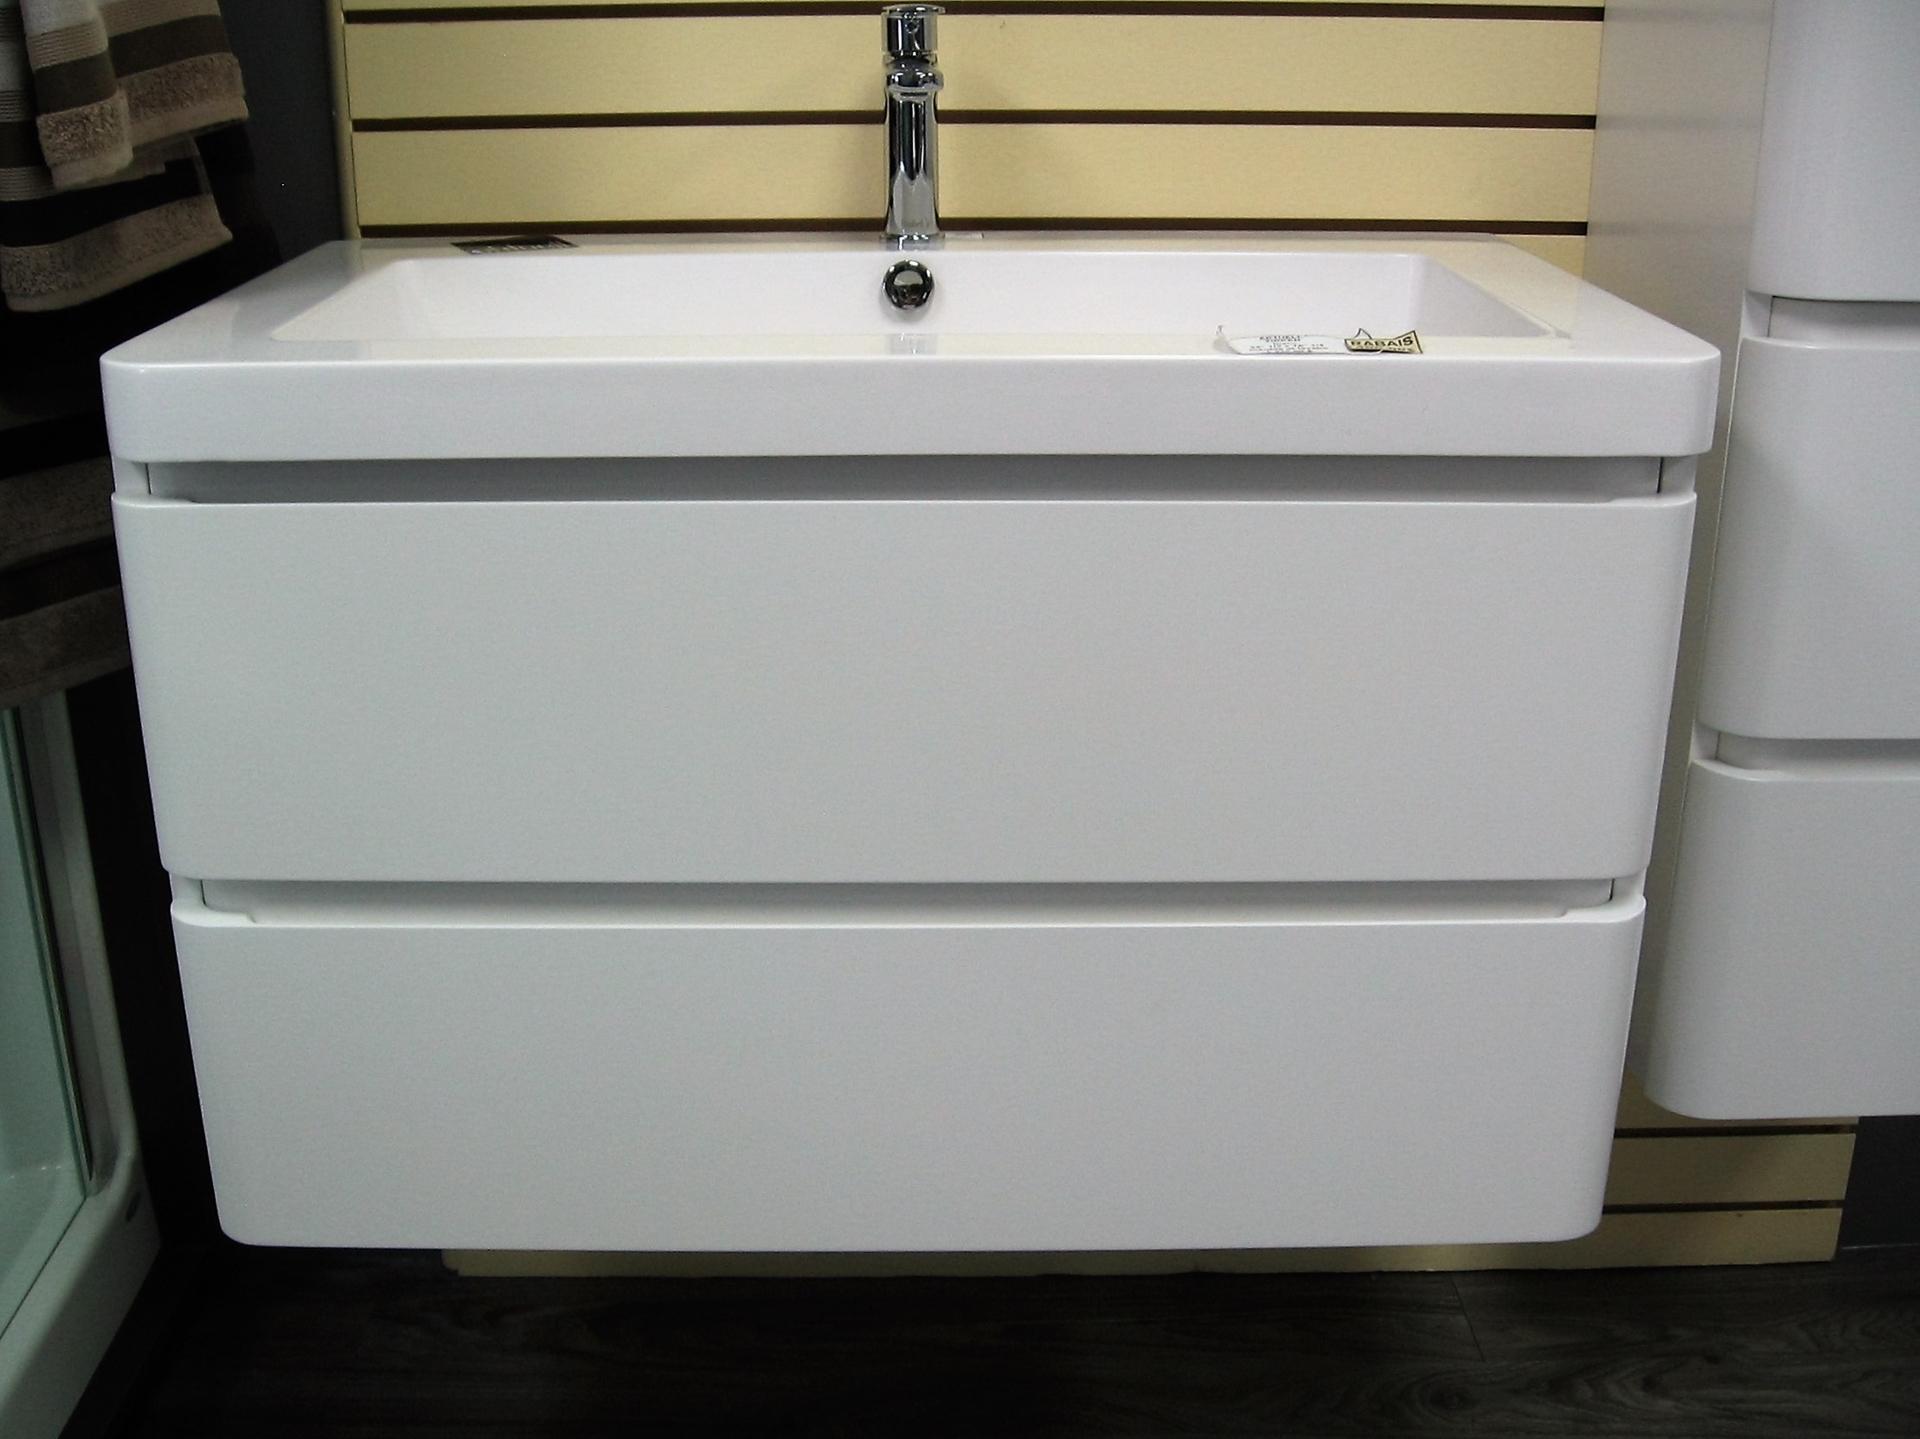 Magasin liquidation salle de bain les for Meuble lavabo liquidation